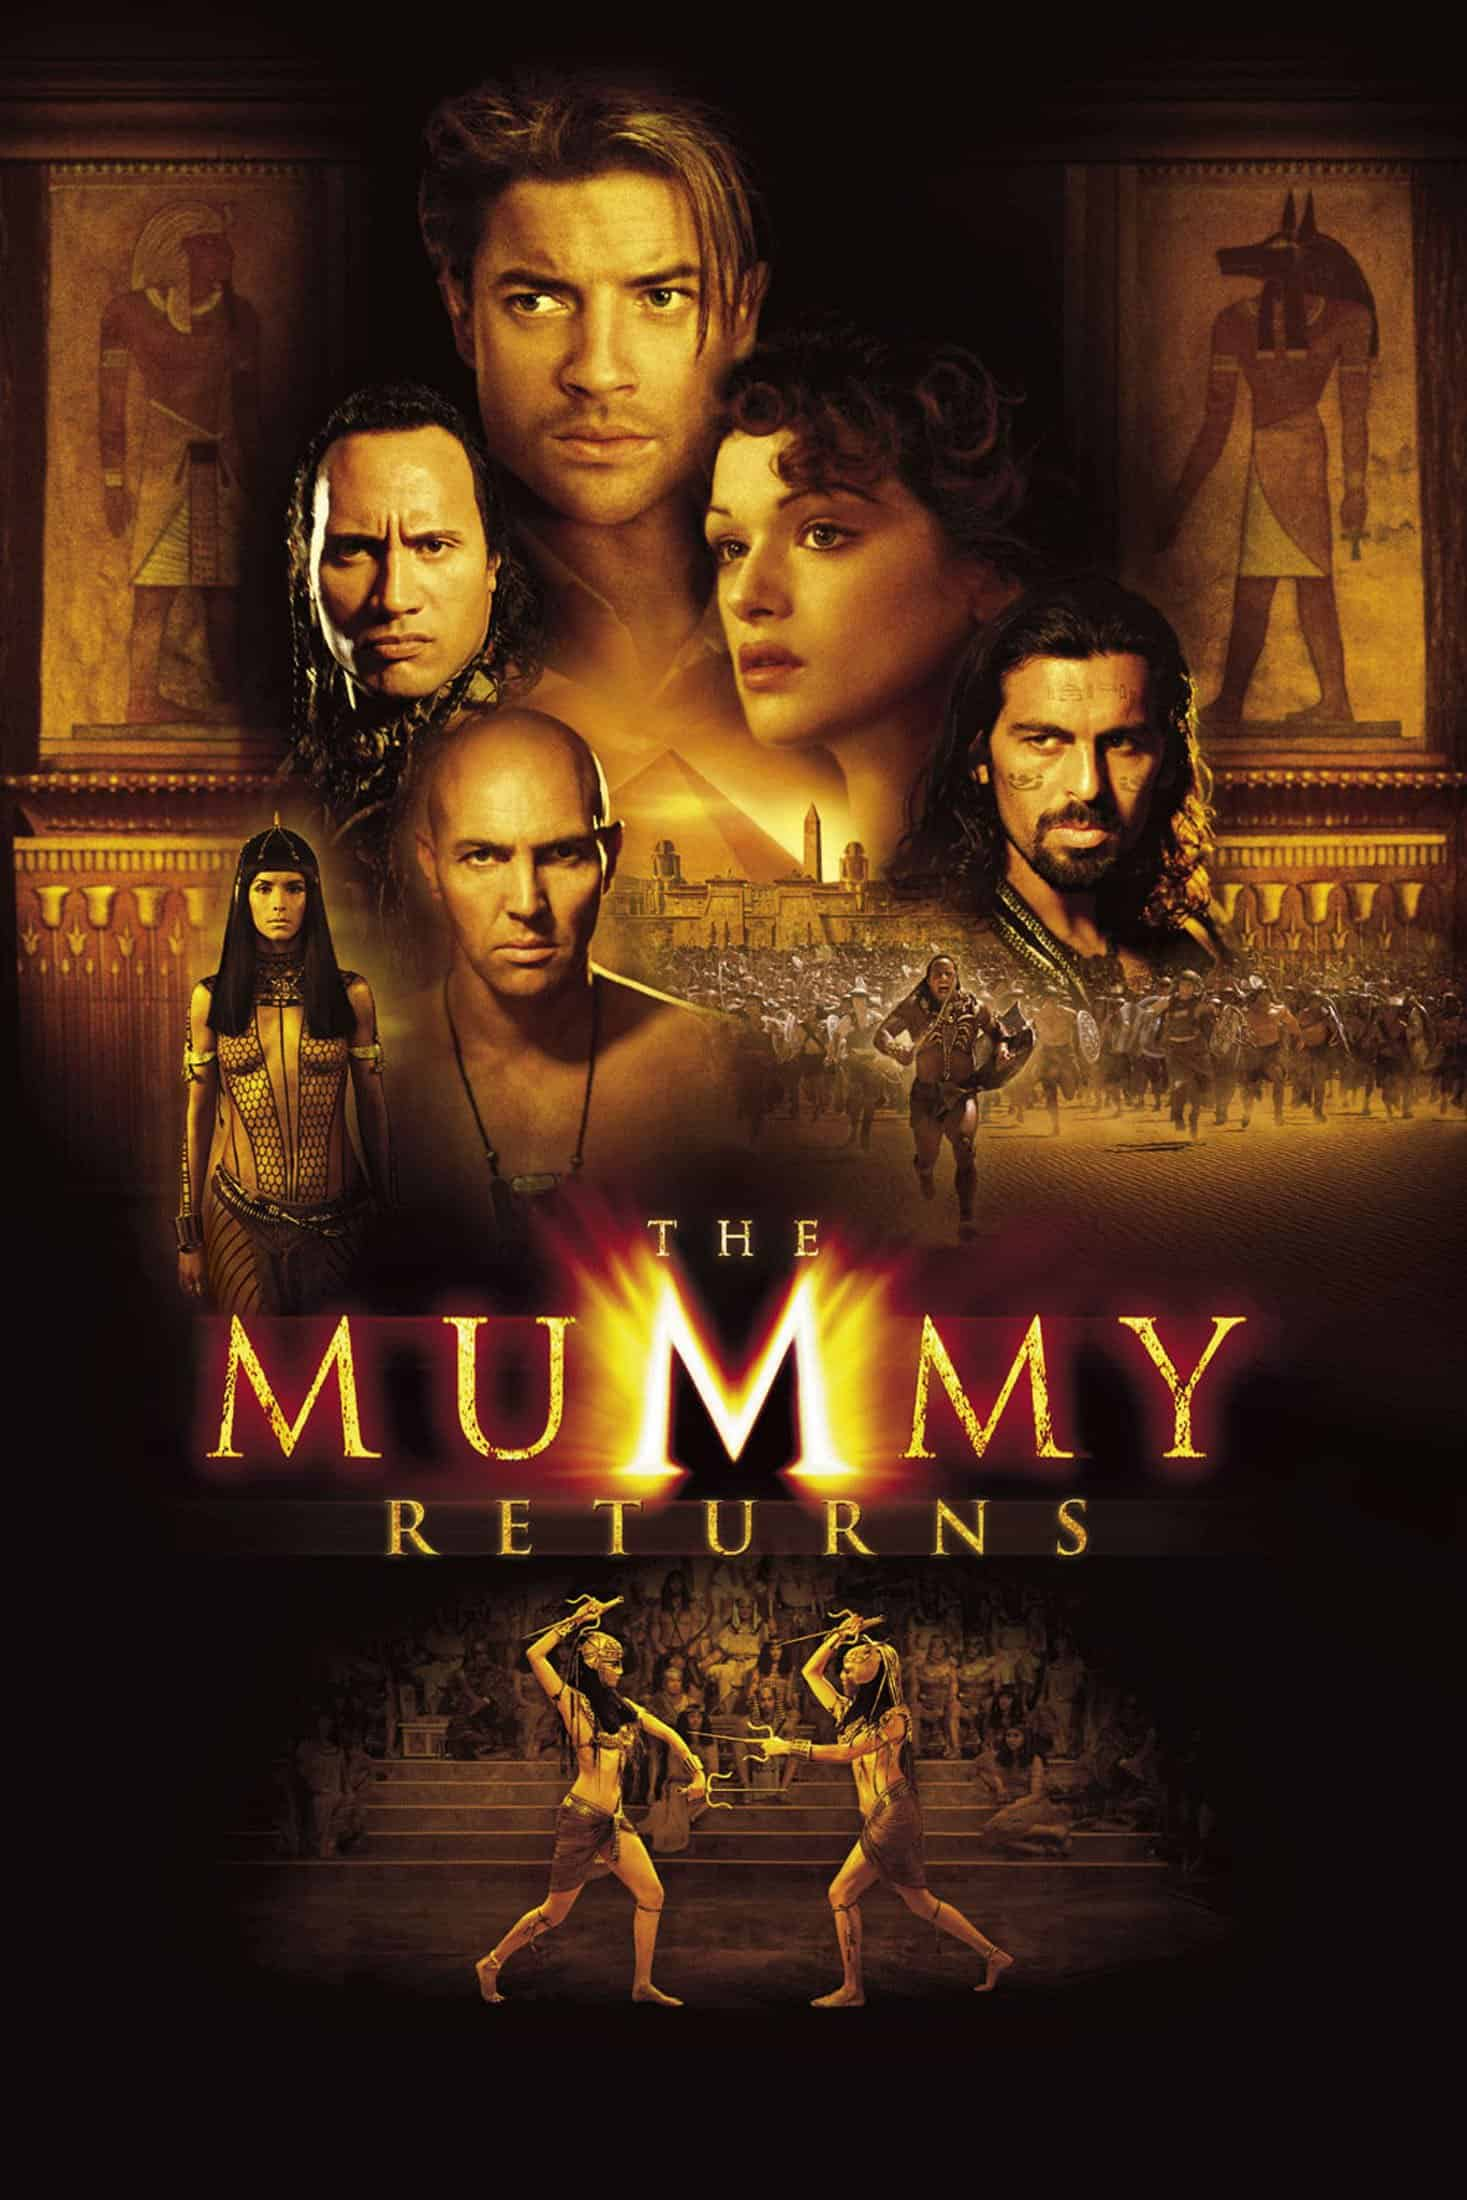 The Mummy Returns, 2001